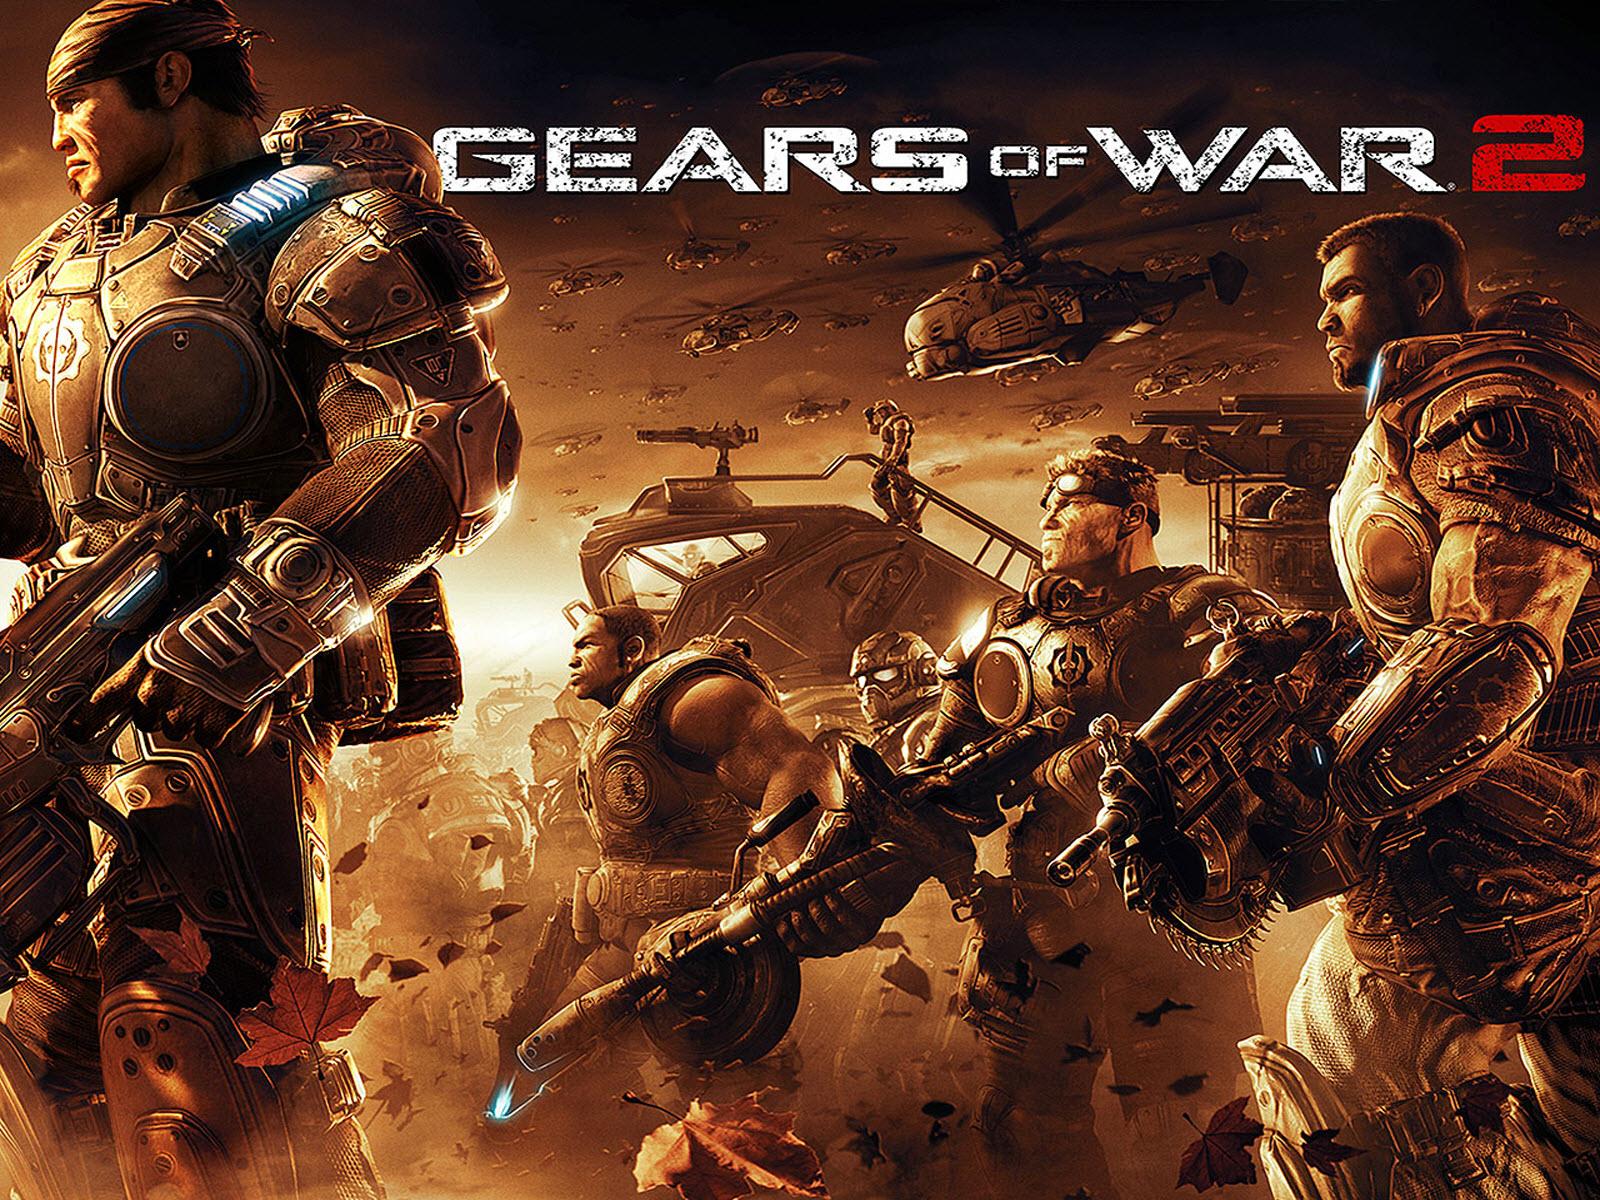 Free Download Gears Of War 4 Wallpaper Hd Gear Imagenes Wallpapers